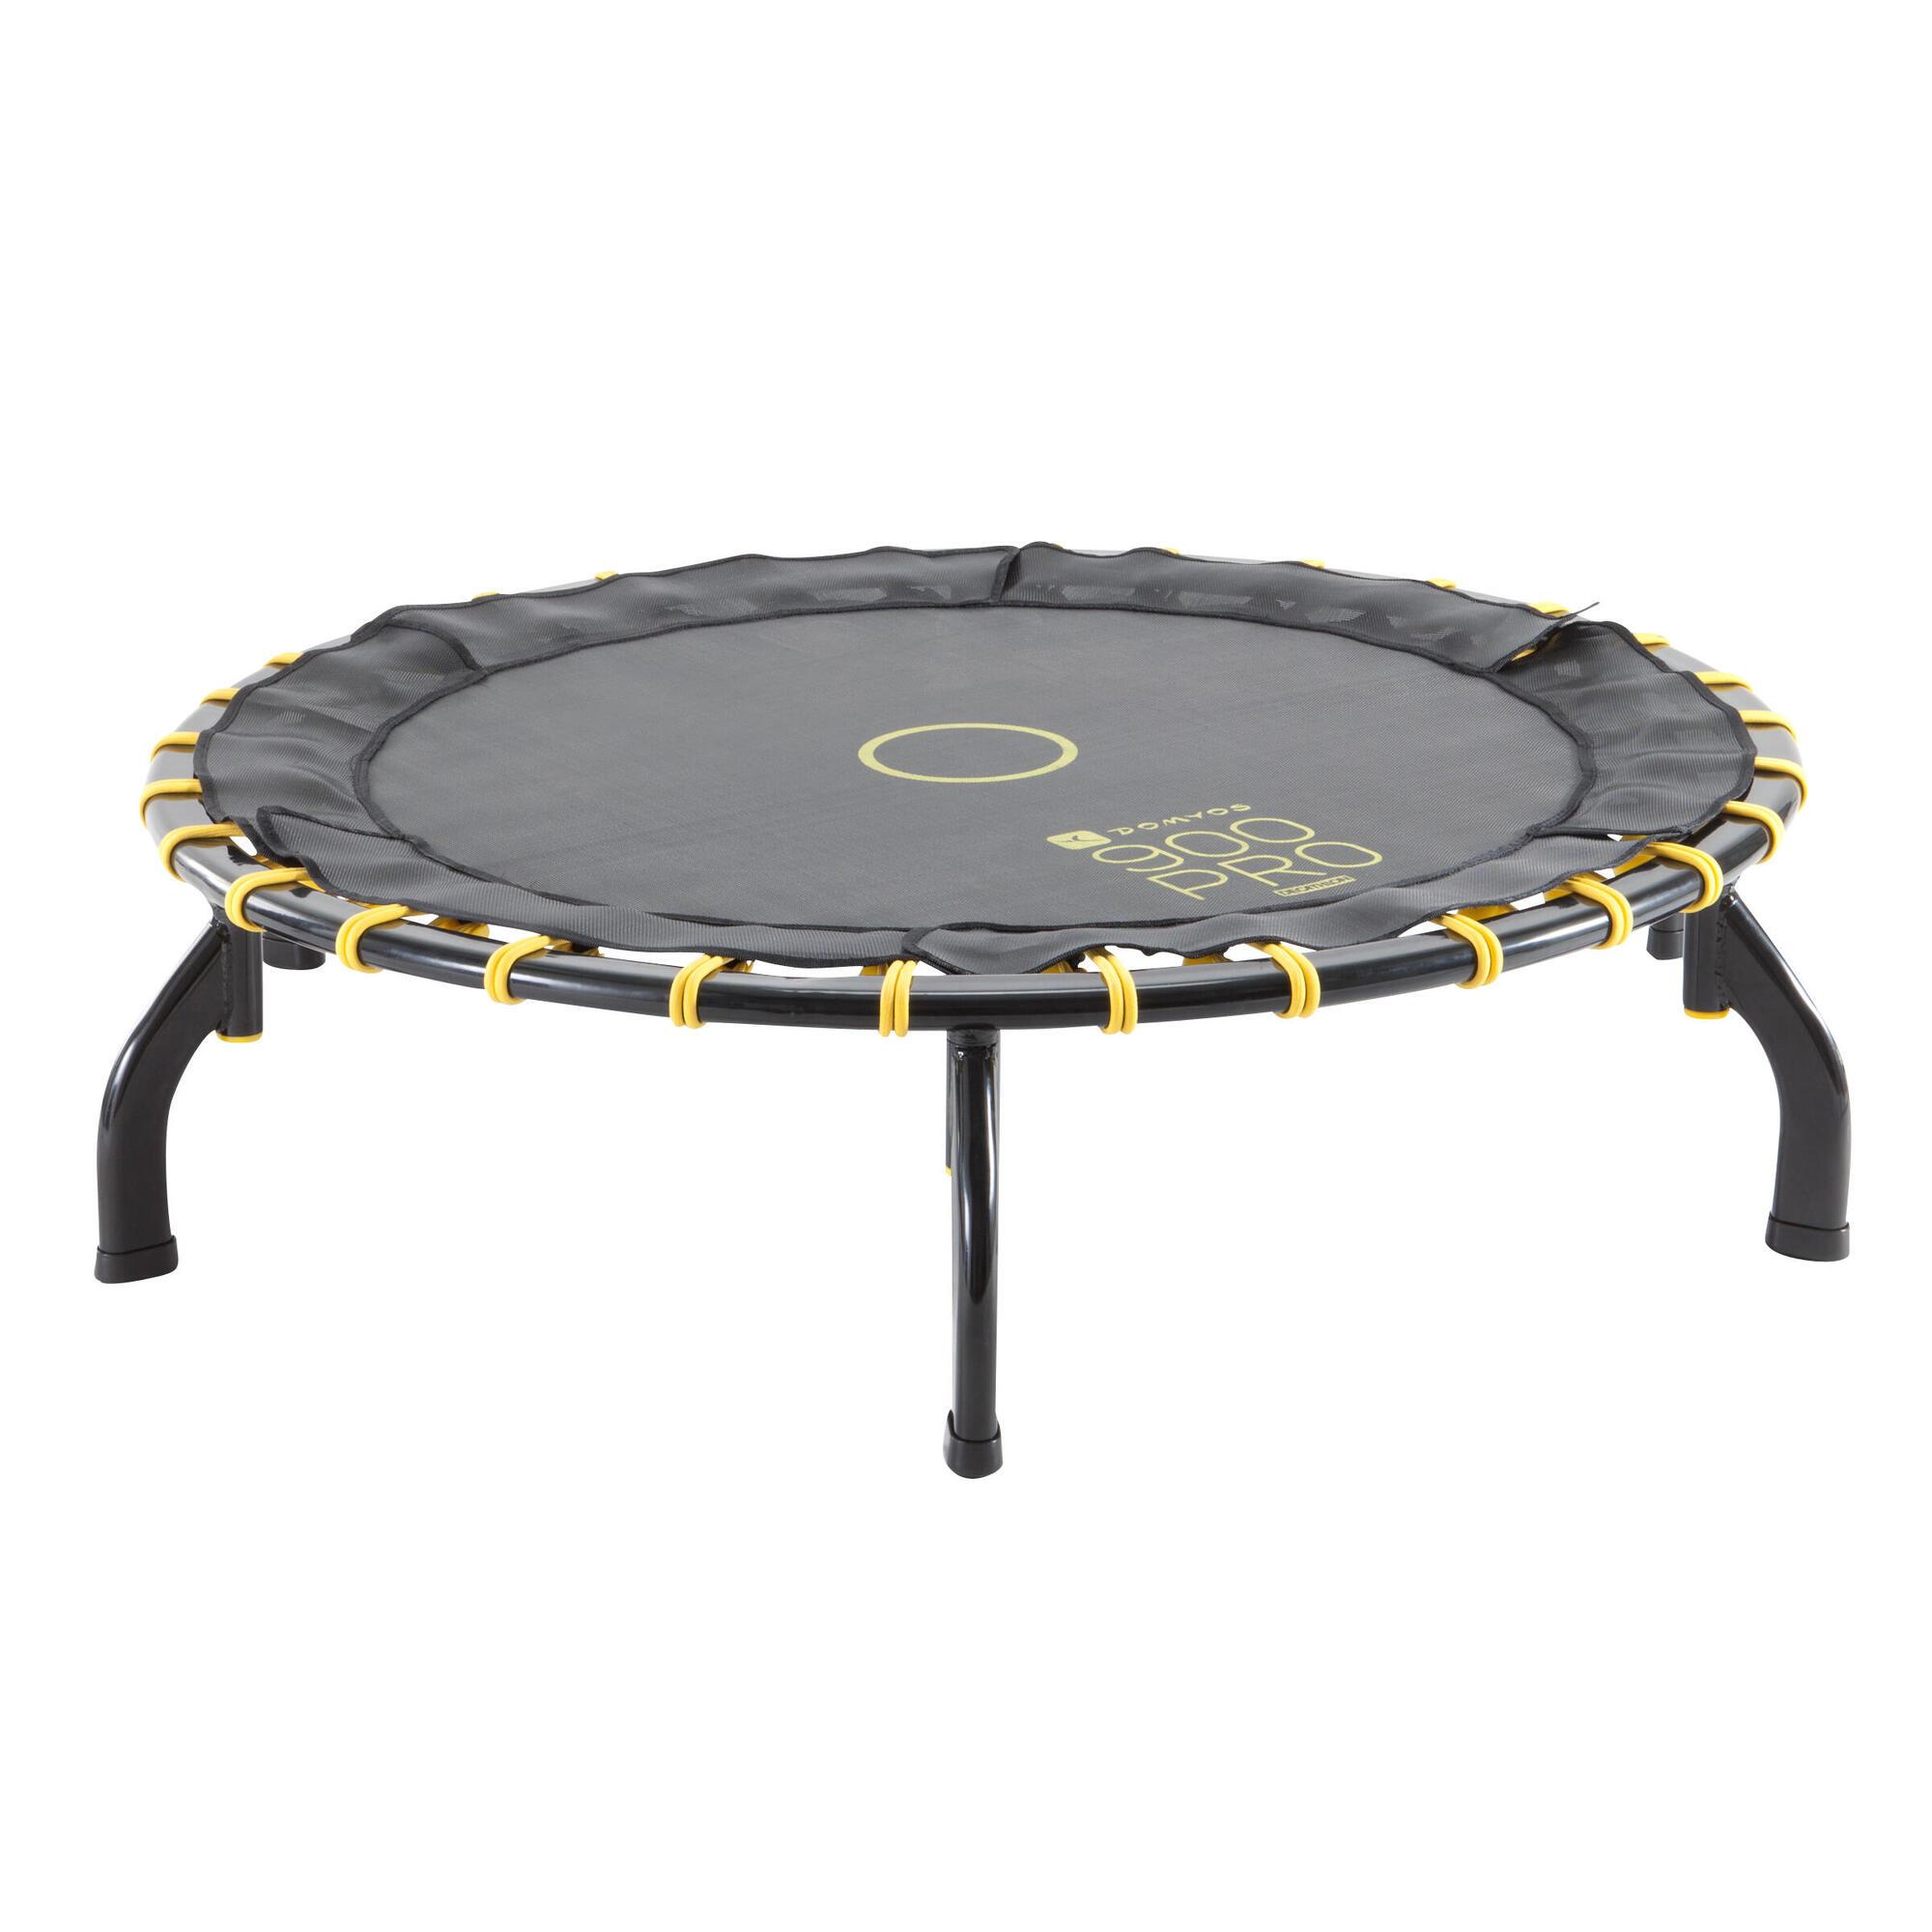 900 pro trampoline domyos by decathlon. Black Bedroom Furniture Sets. Home Design Ideas